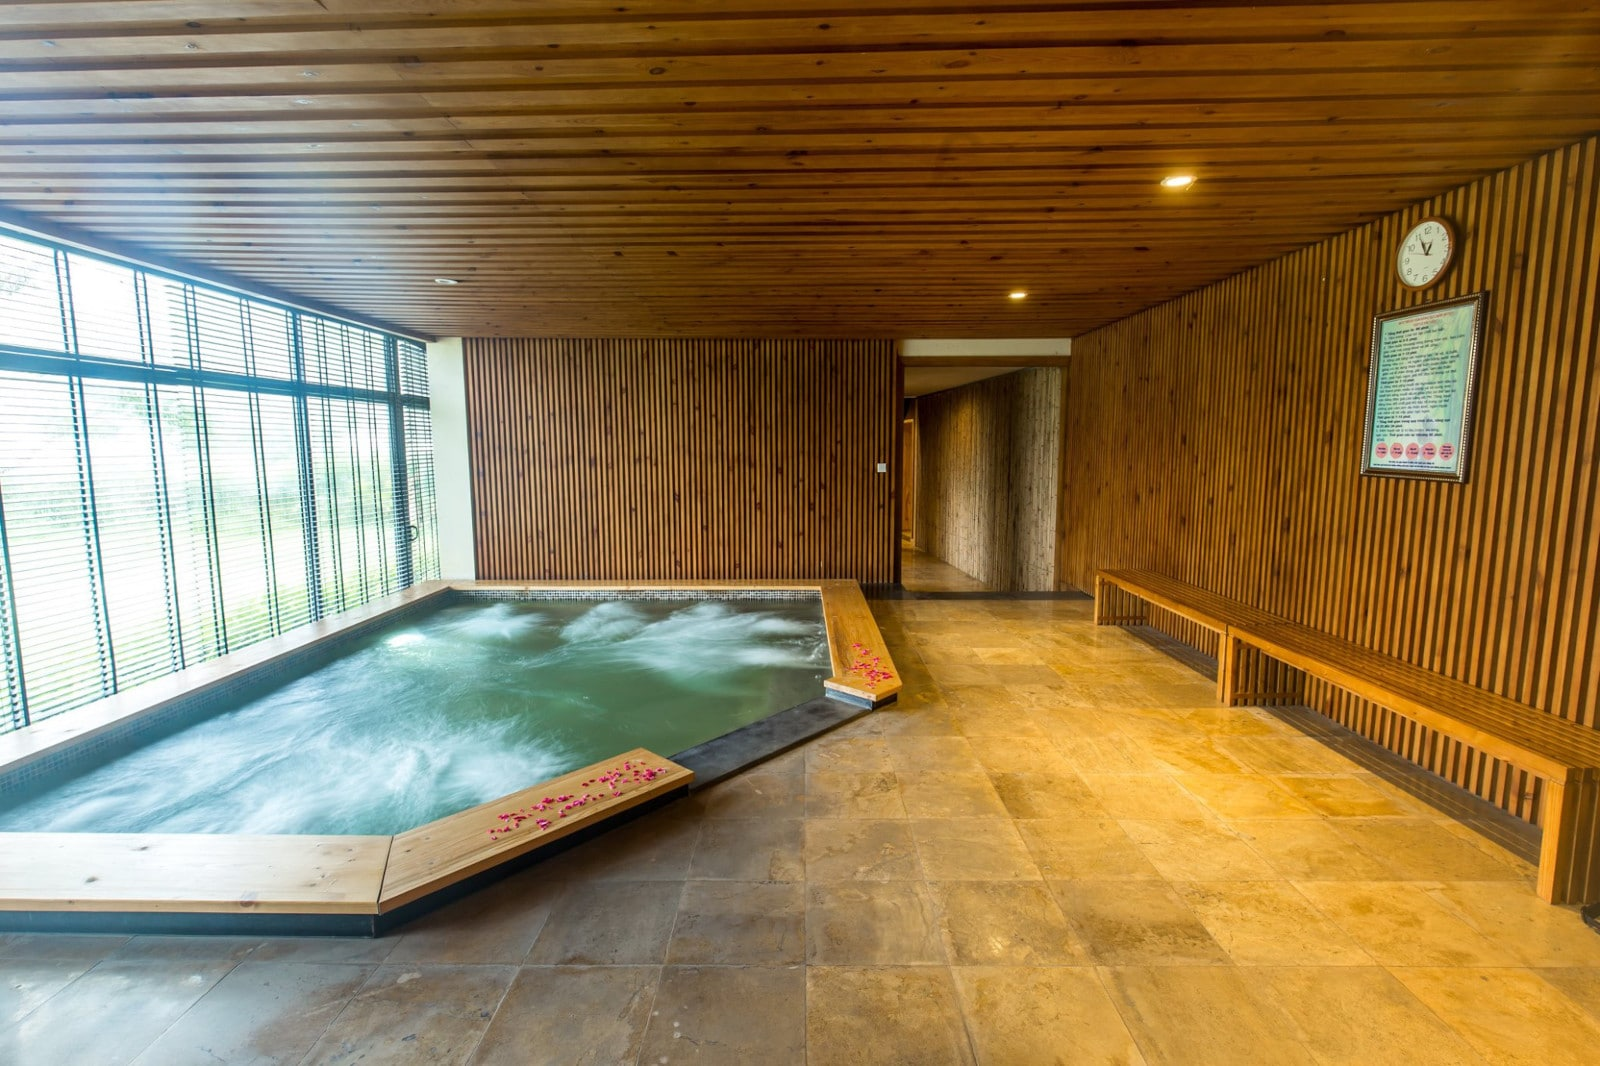 Image of a indoor japanese onsen at the Serena Resort Kim Boi in Vietnam